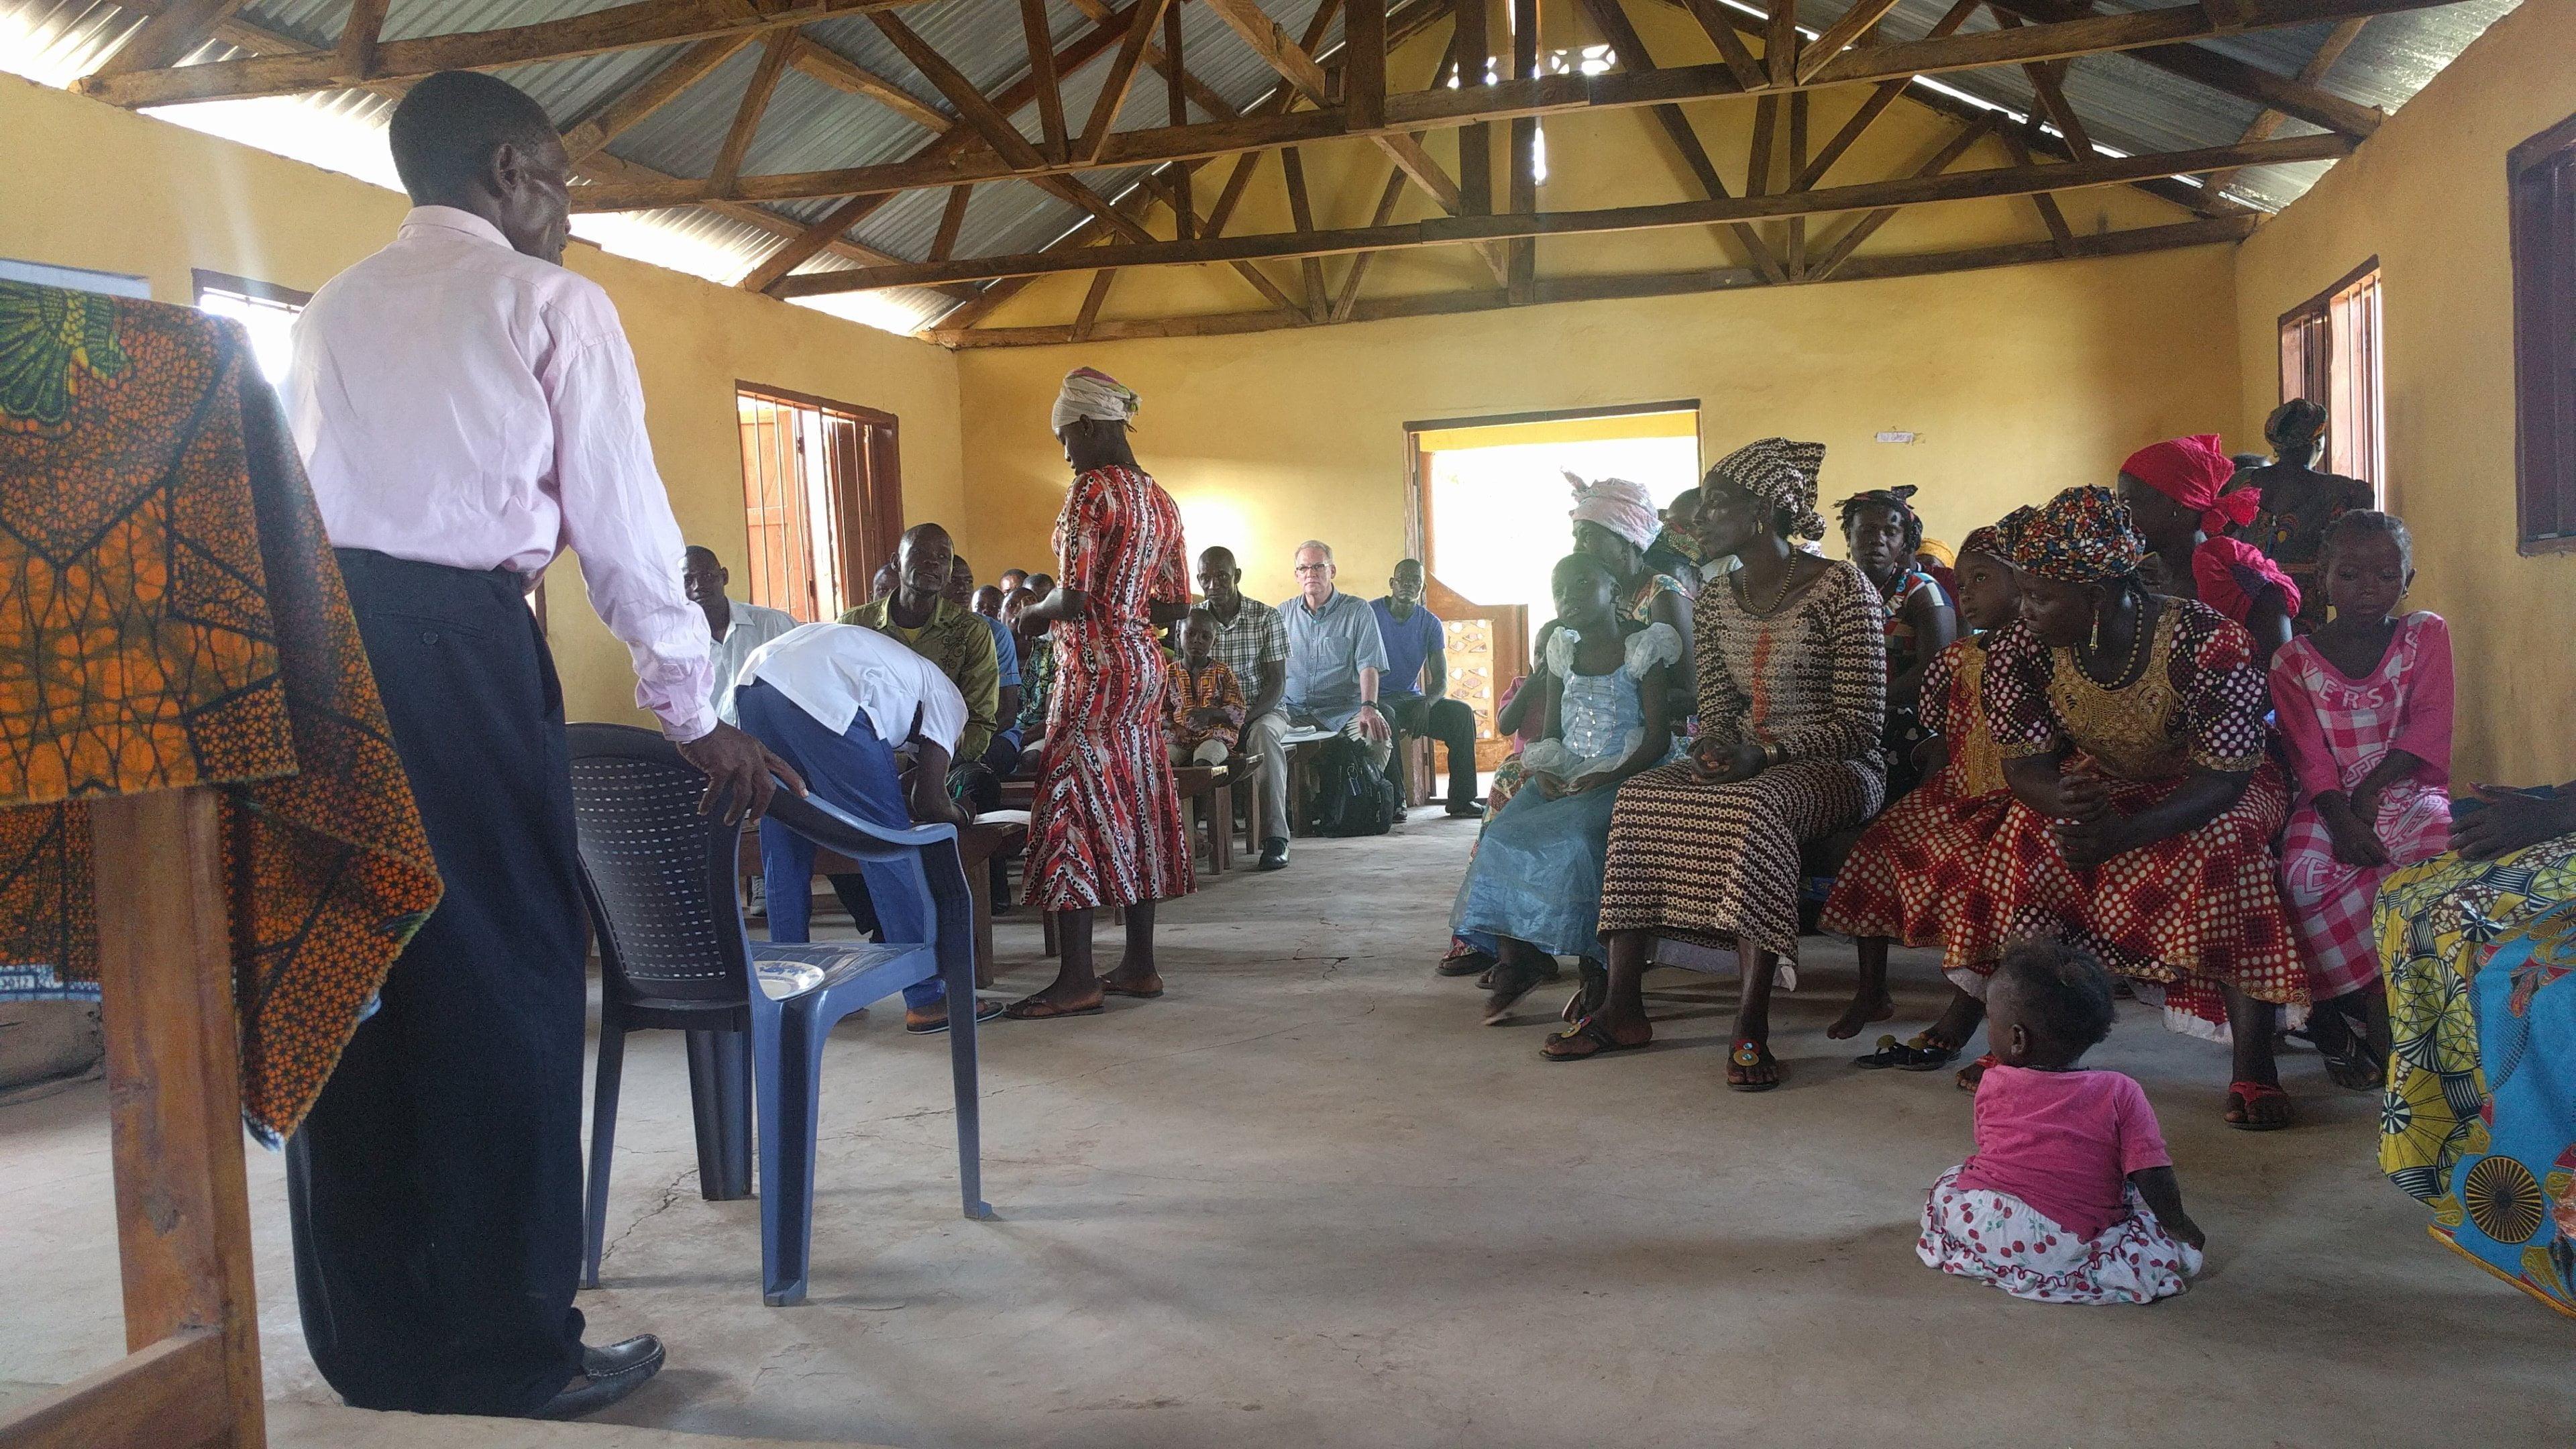 A Verse That Describes The Church In Kathirie Sierra Leone